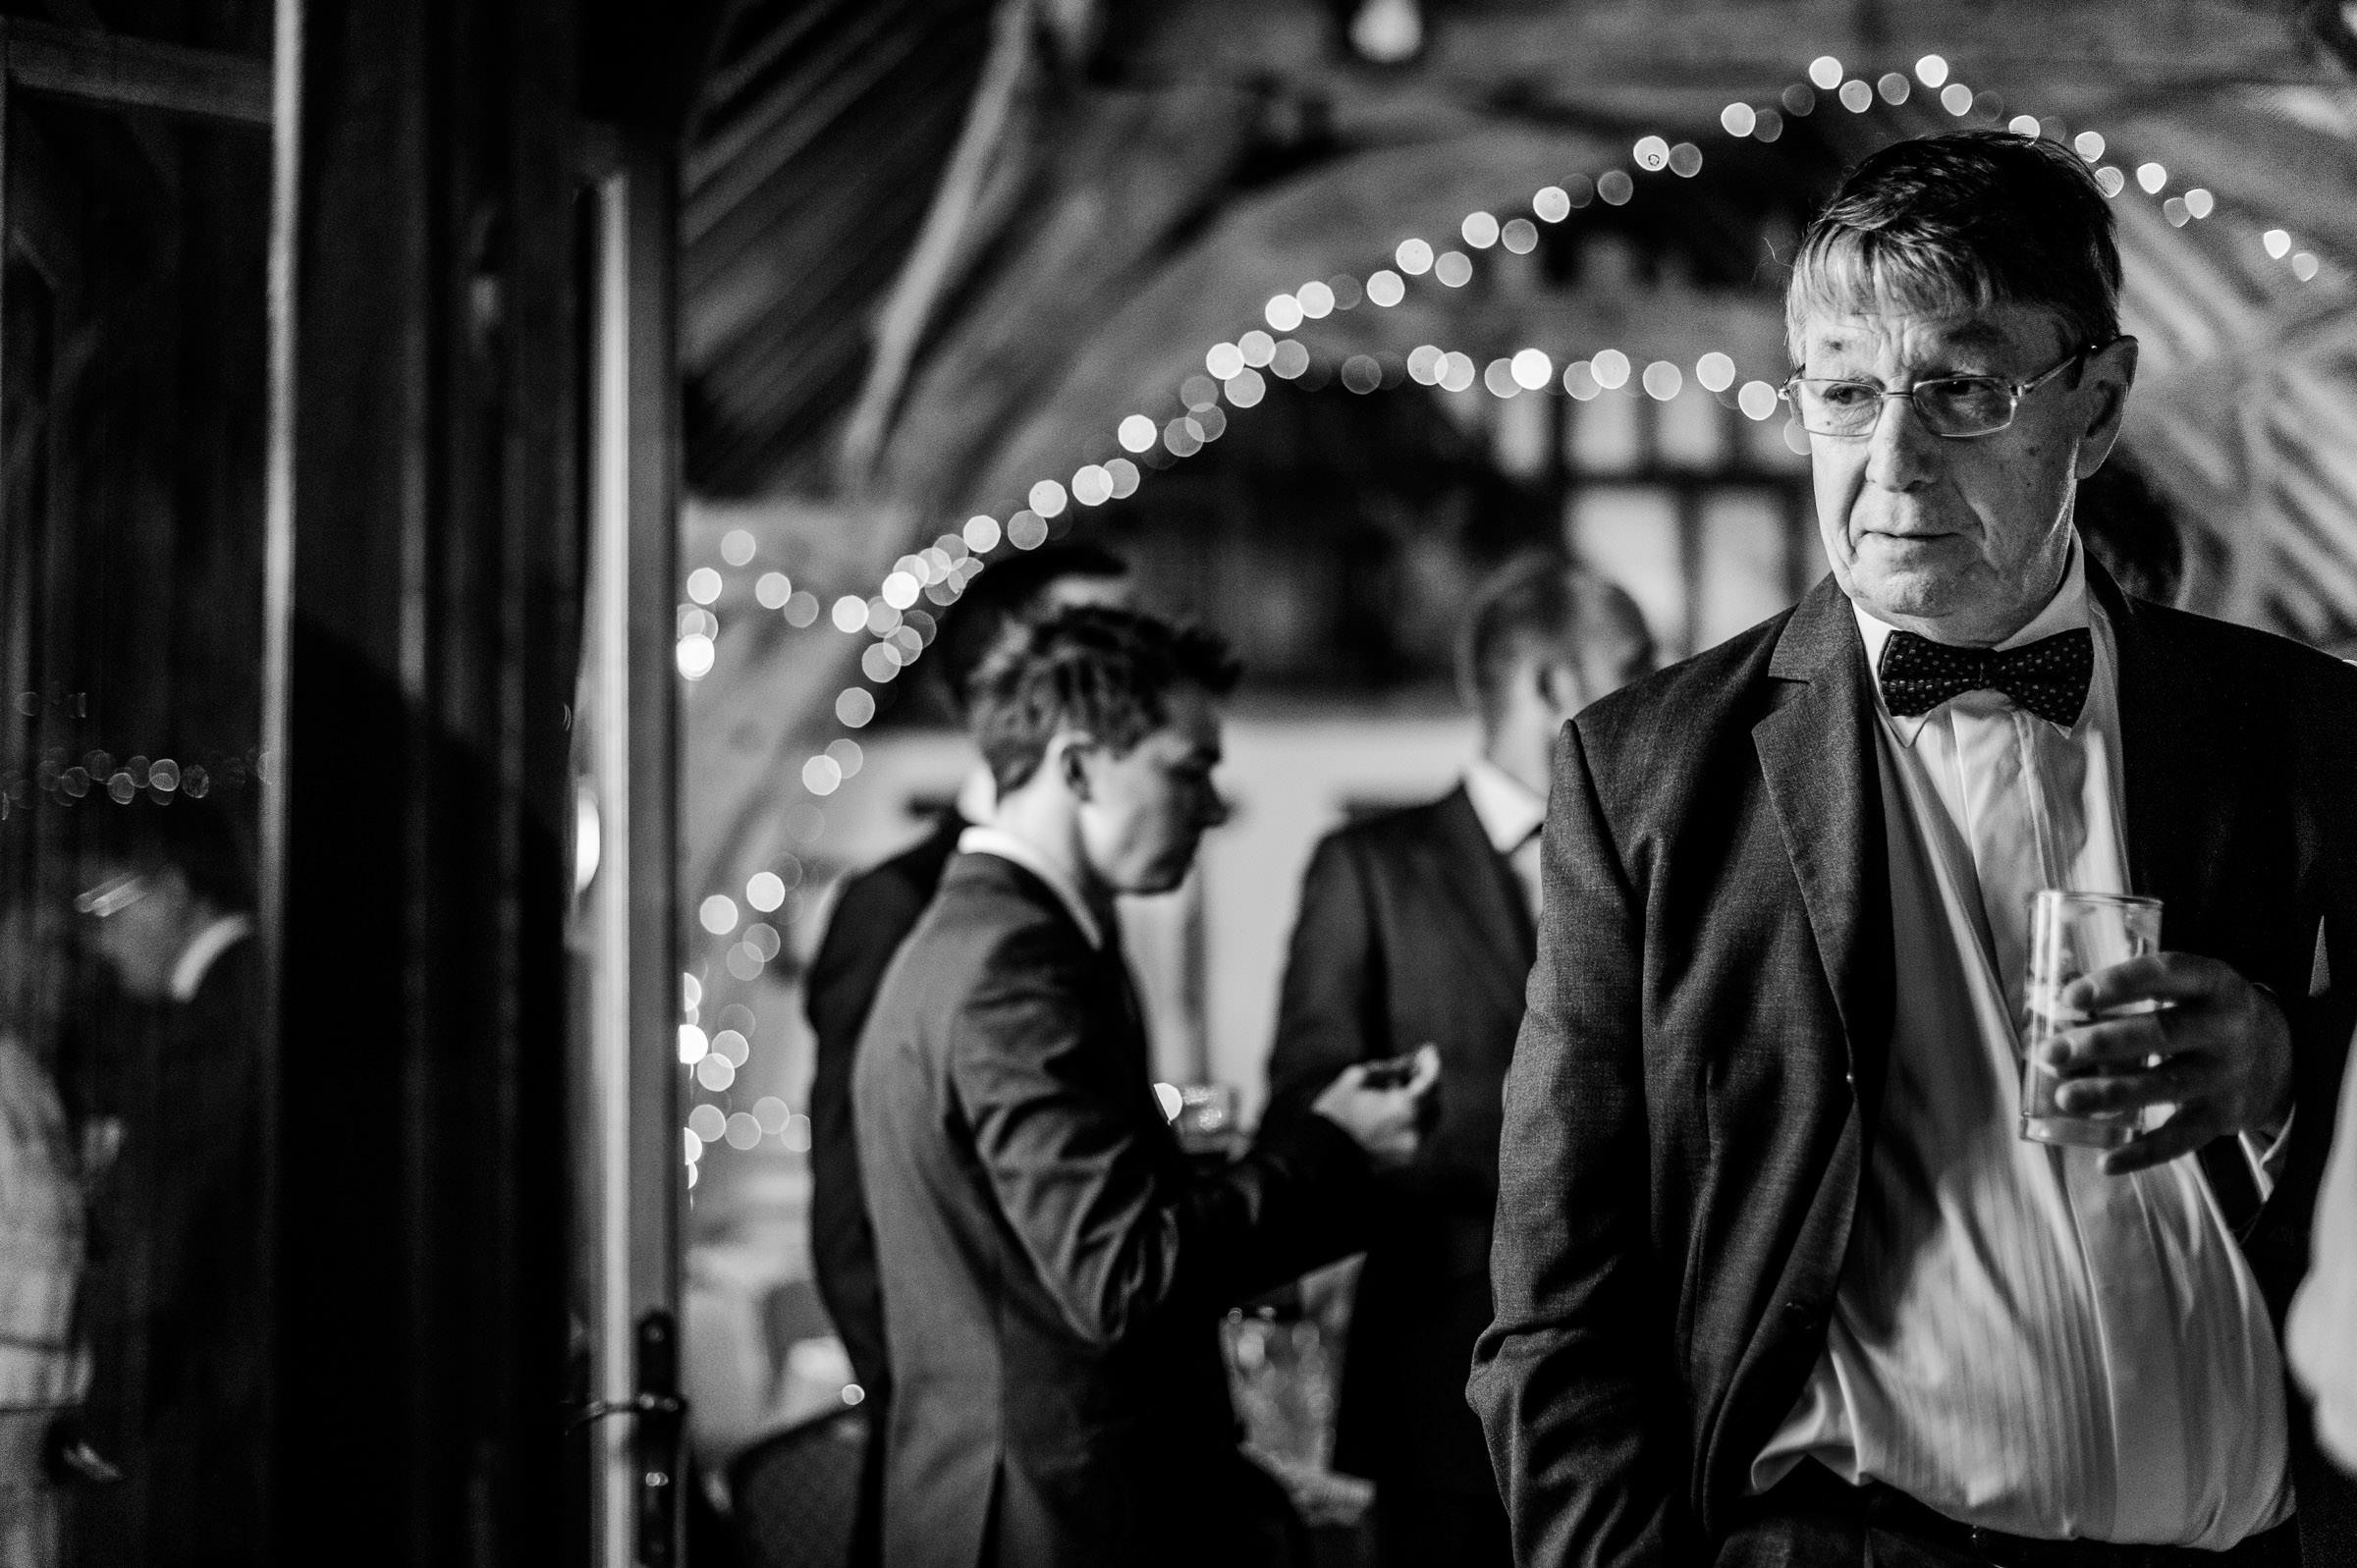 Notley Tythe Barn Reportage Wedding Photos 021.jpg